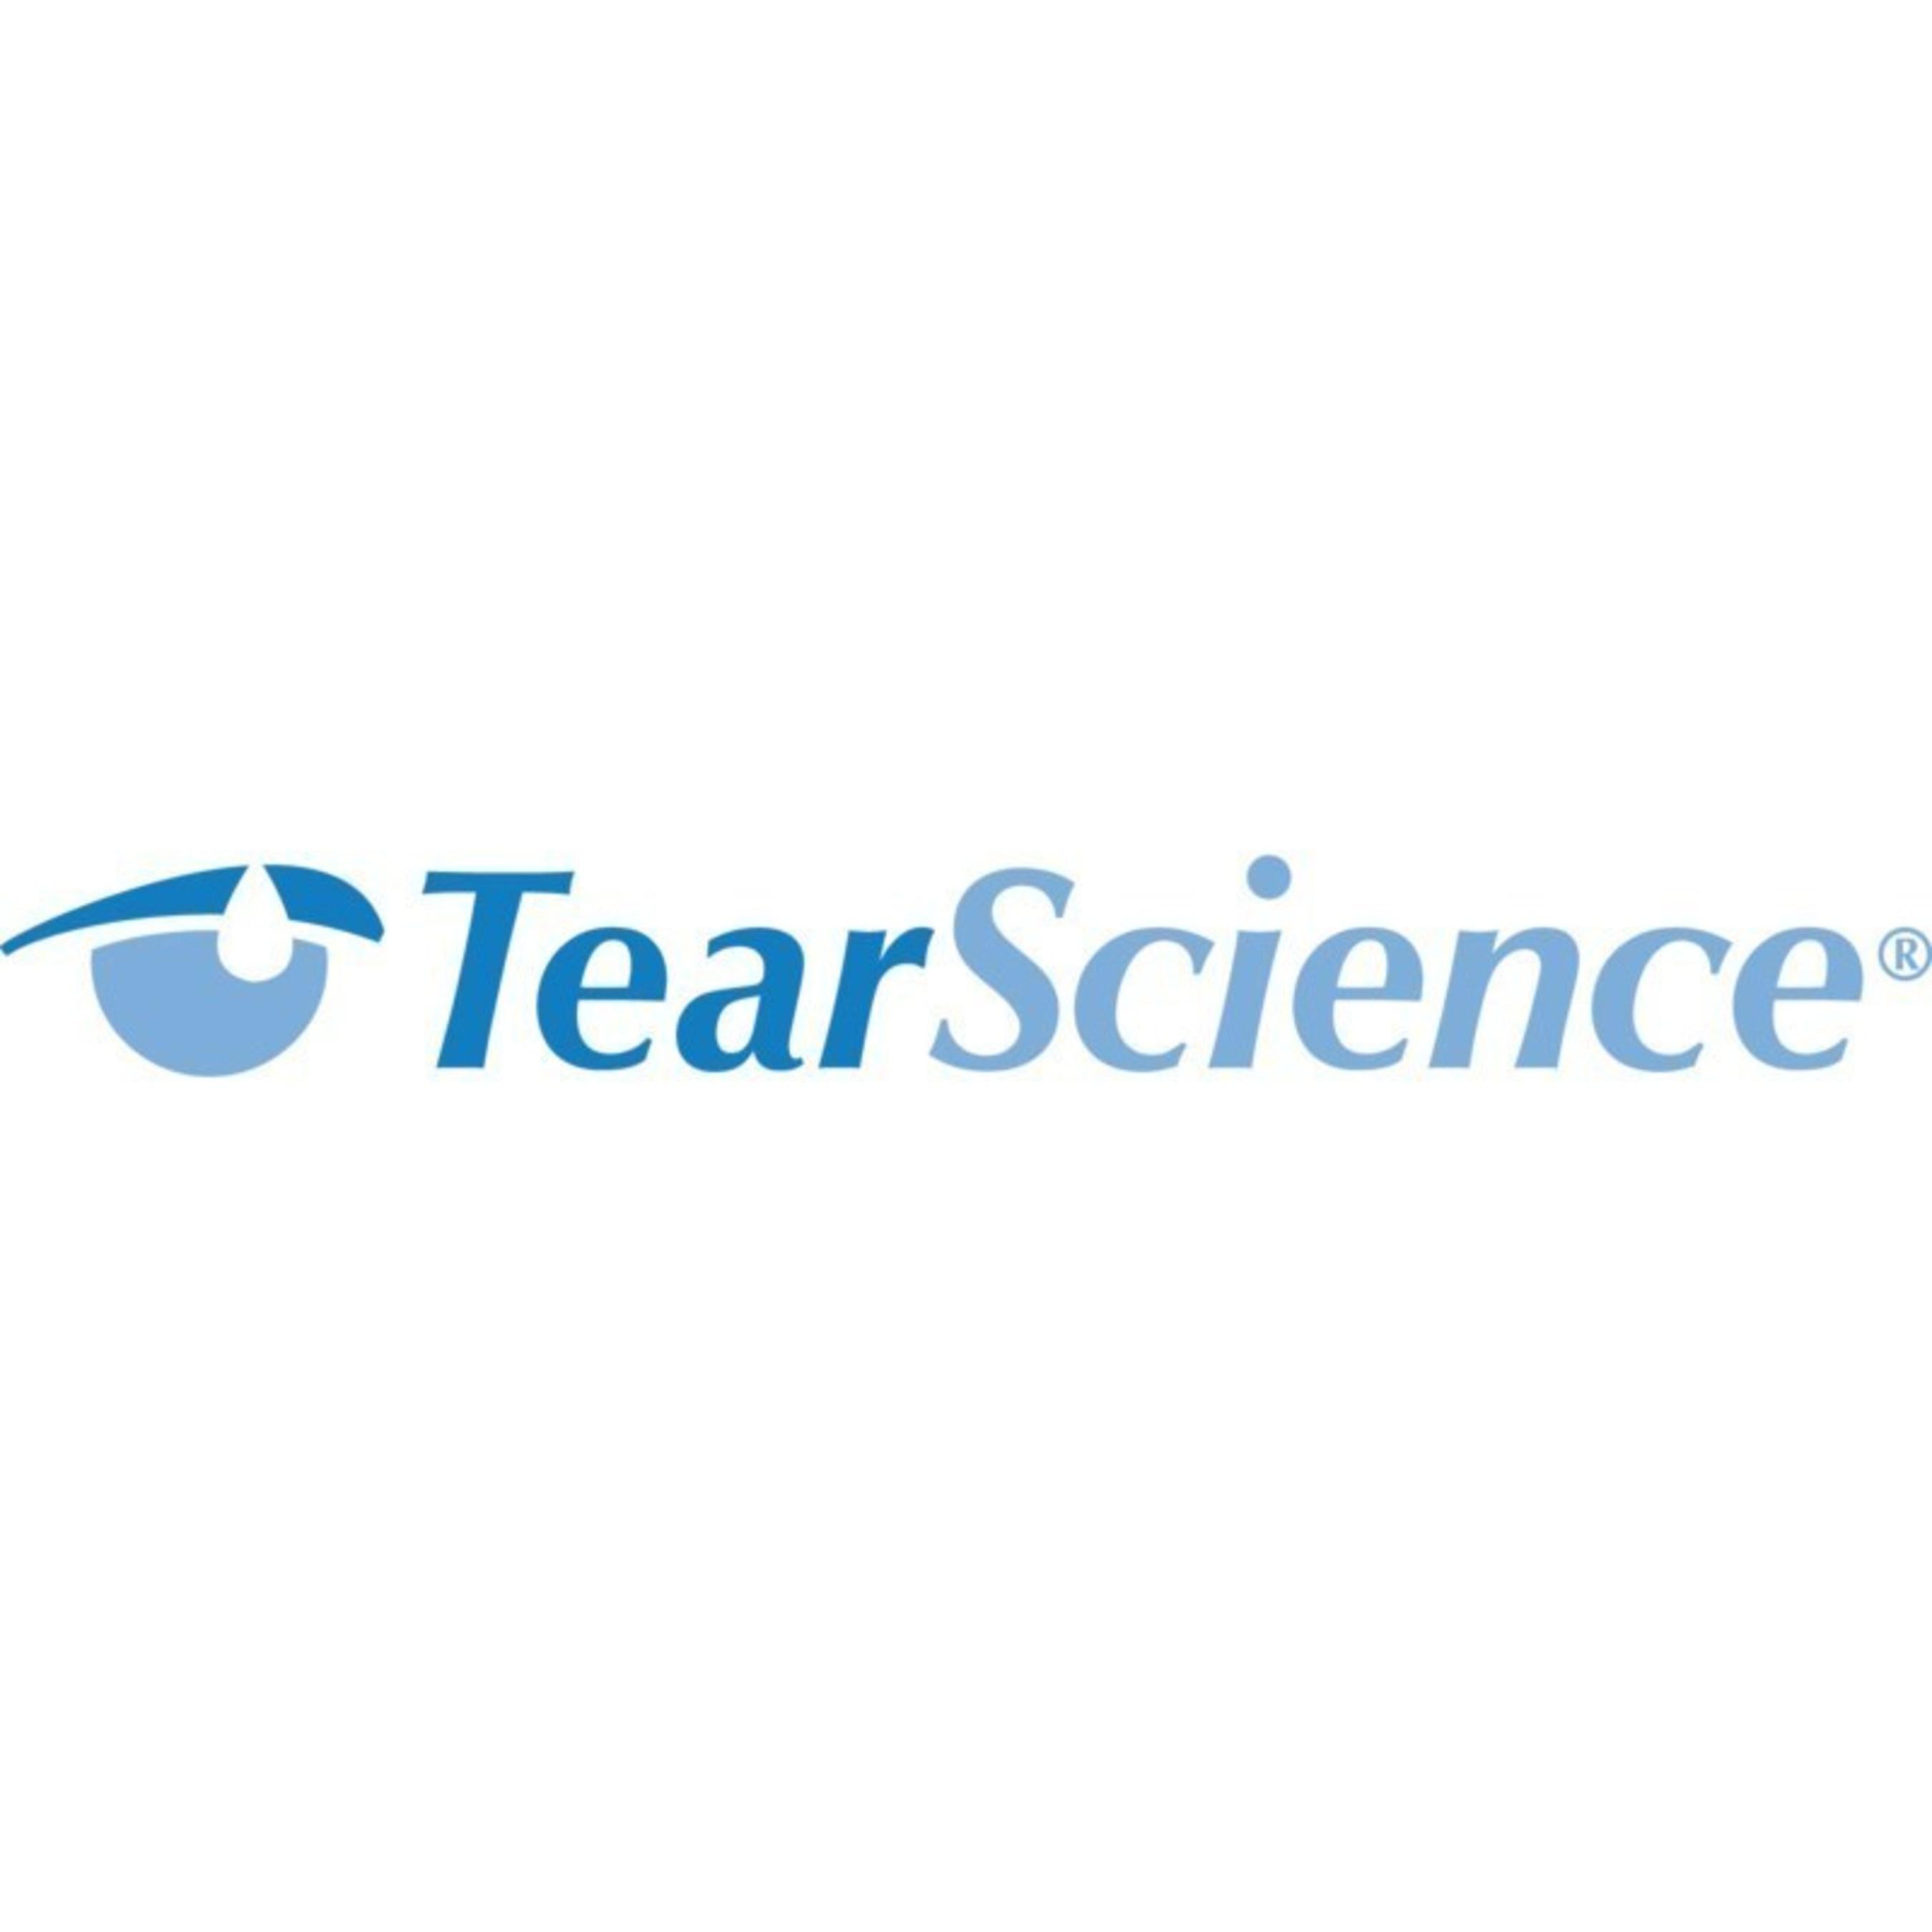 TearScience(R) (PRNewsFoto/TearScience)